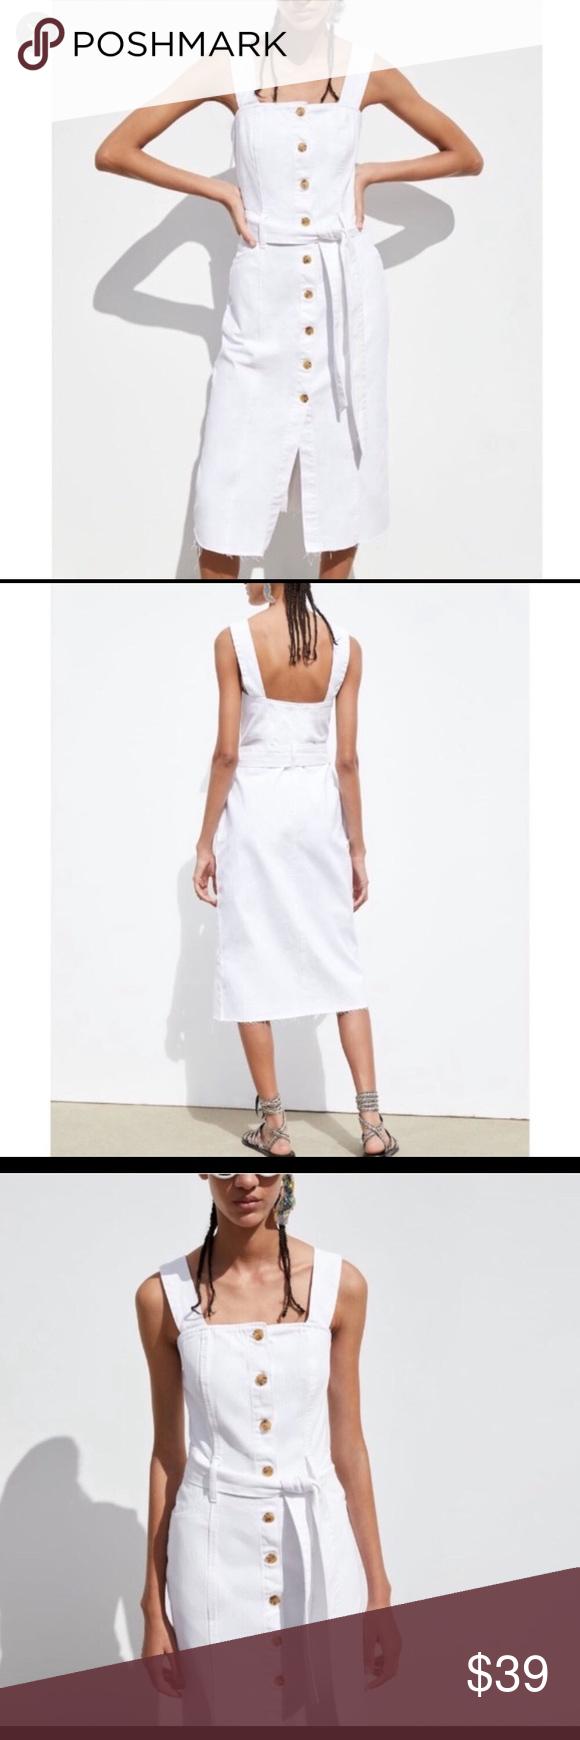 45+ White jean dress information